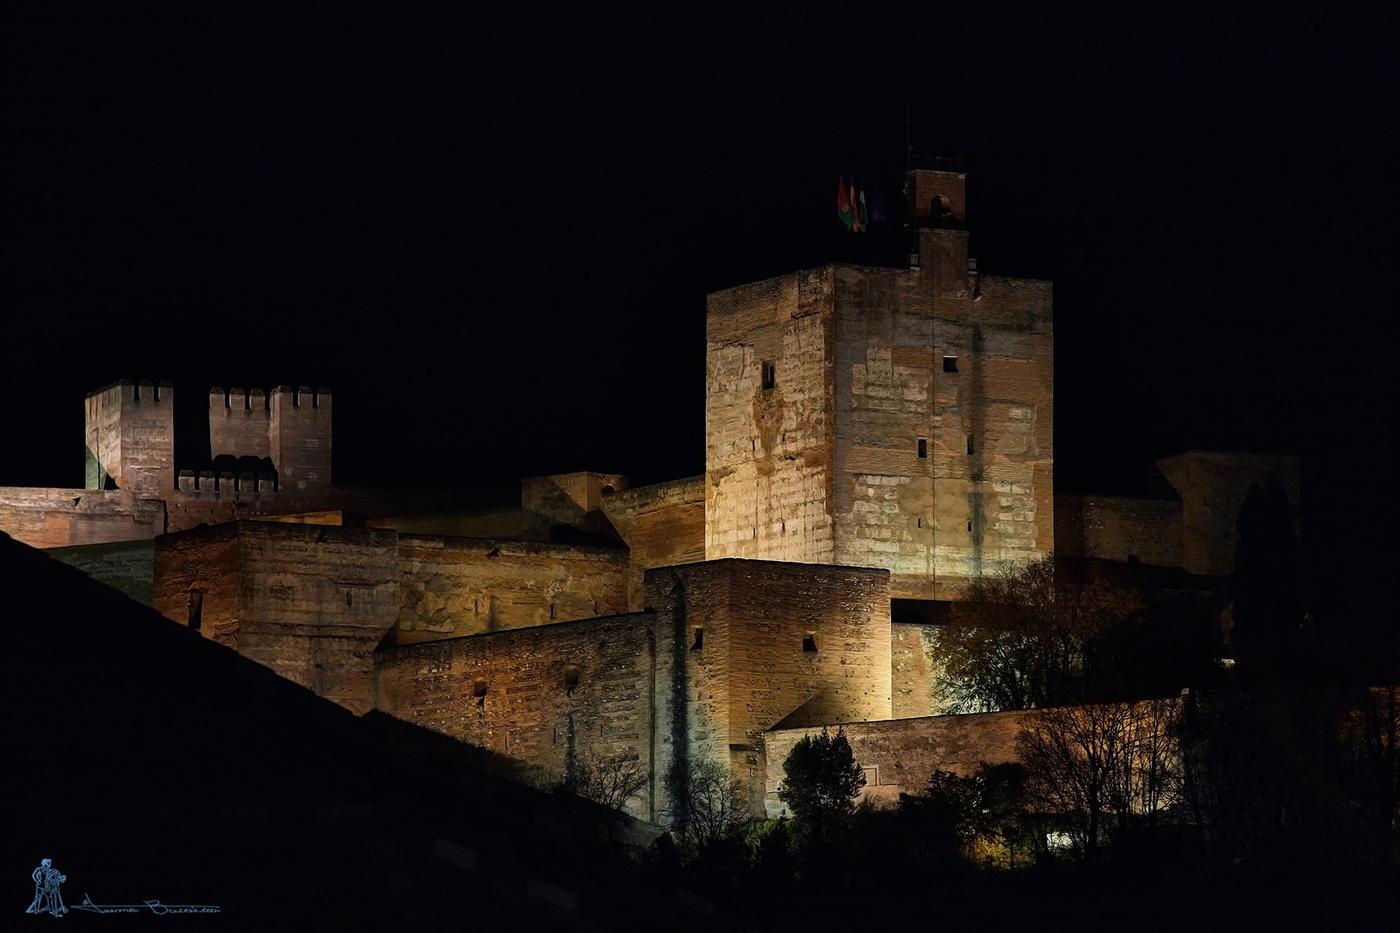 Alhambra (Txema Bacaicoa (Colectivo IS))